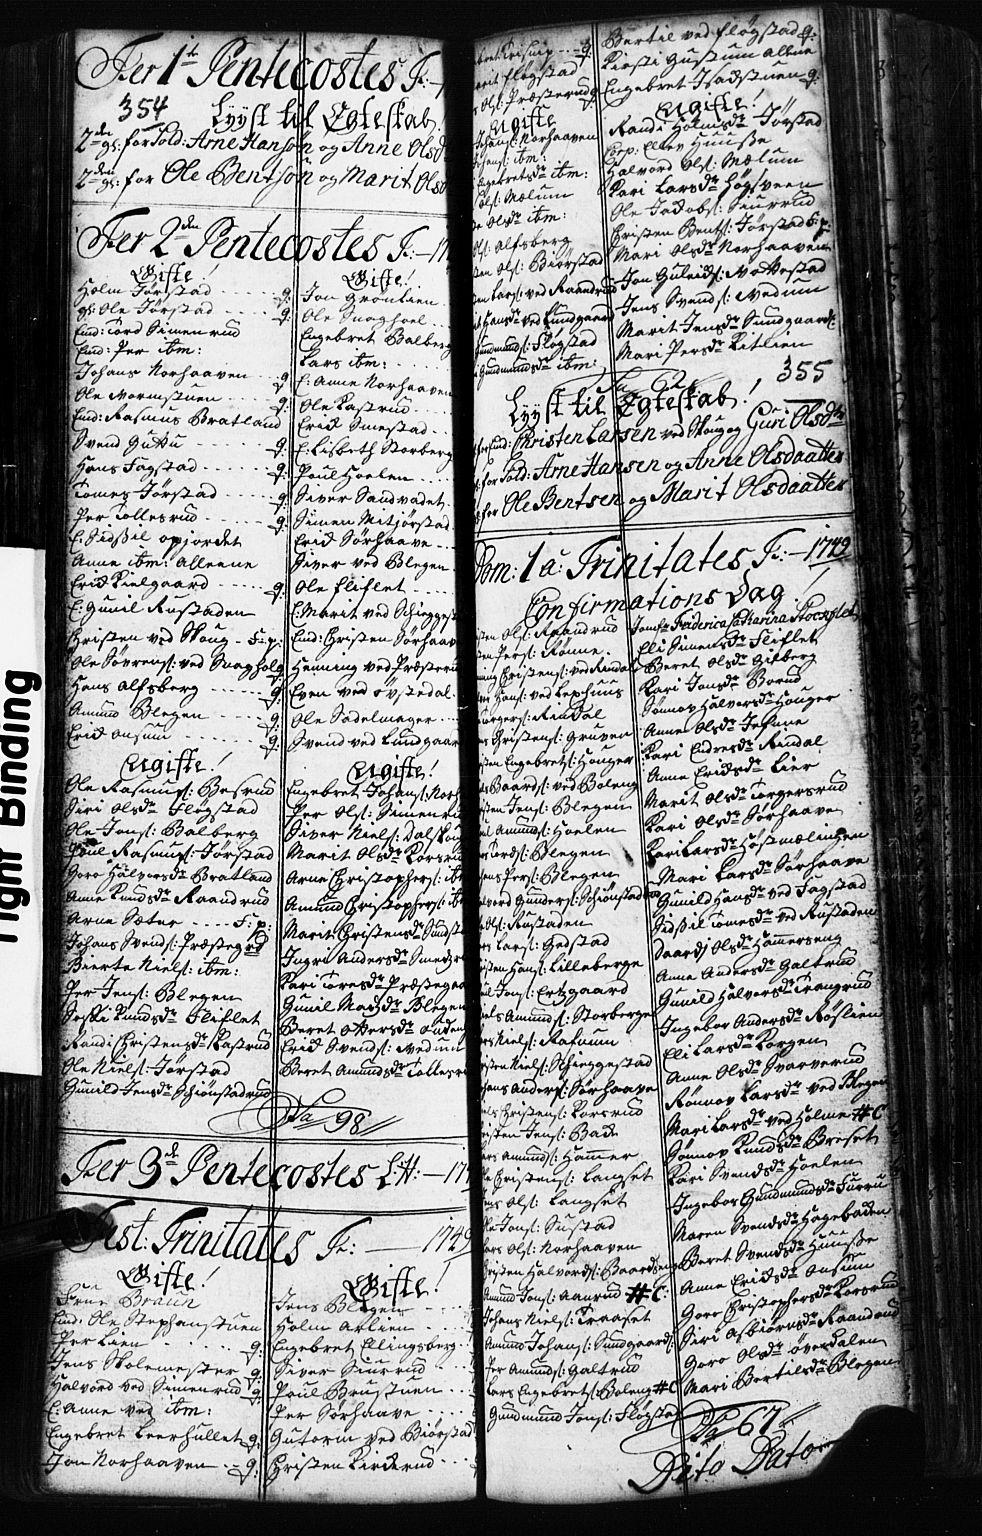 SAH, Fåberg prestekontor, Klokkerbok nr. 2, 1741-1756, s. 354-355